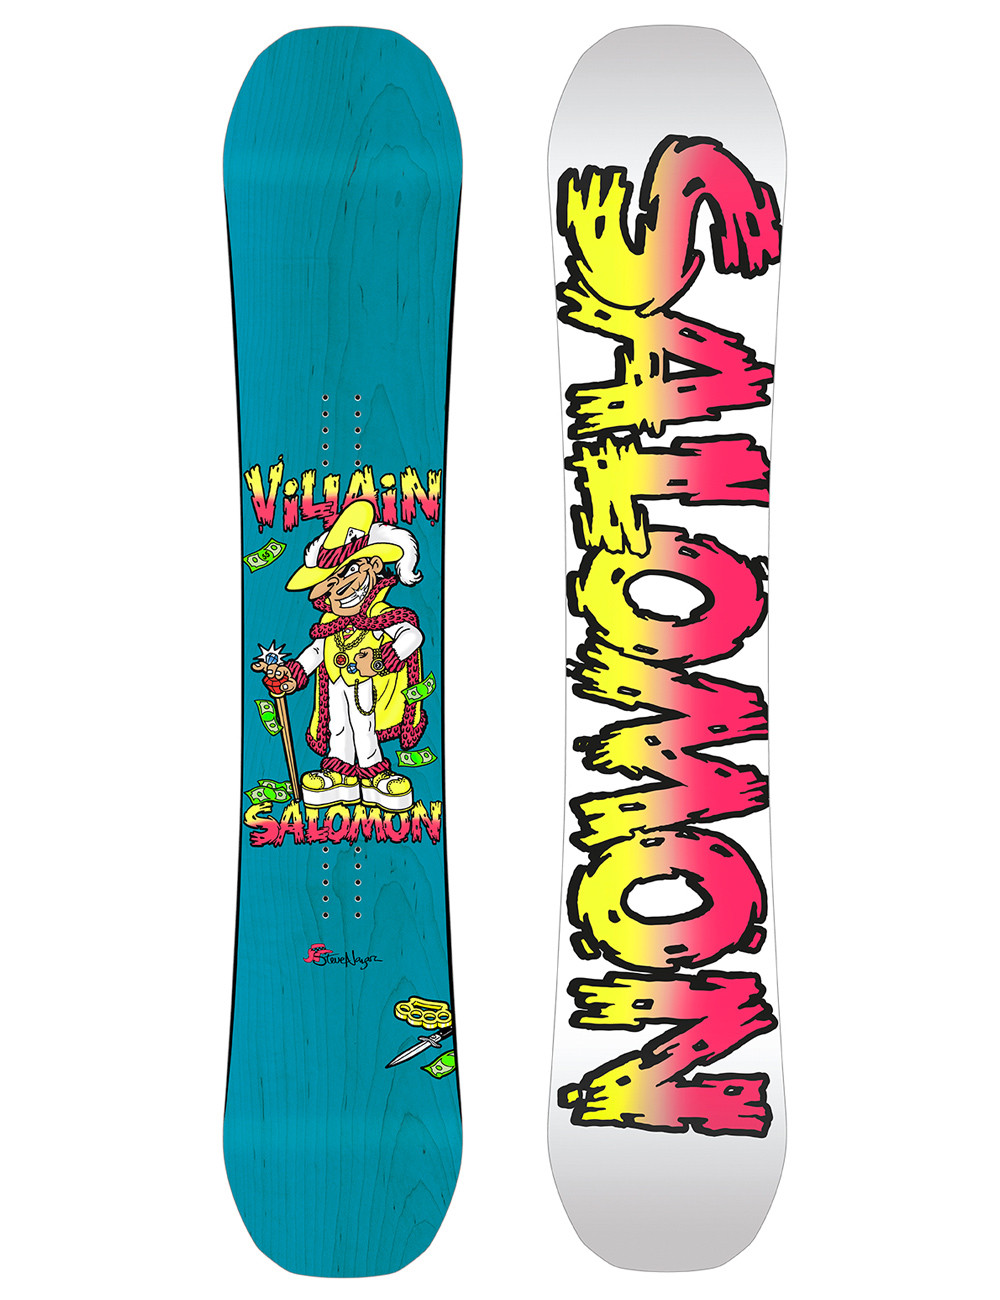 Deska snowboardowa Salomon The Villain Classicks 20182019